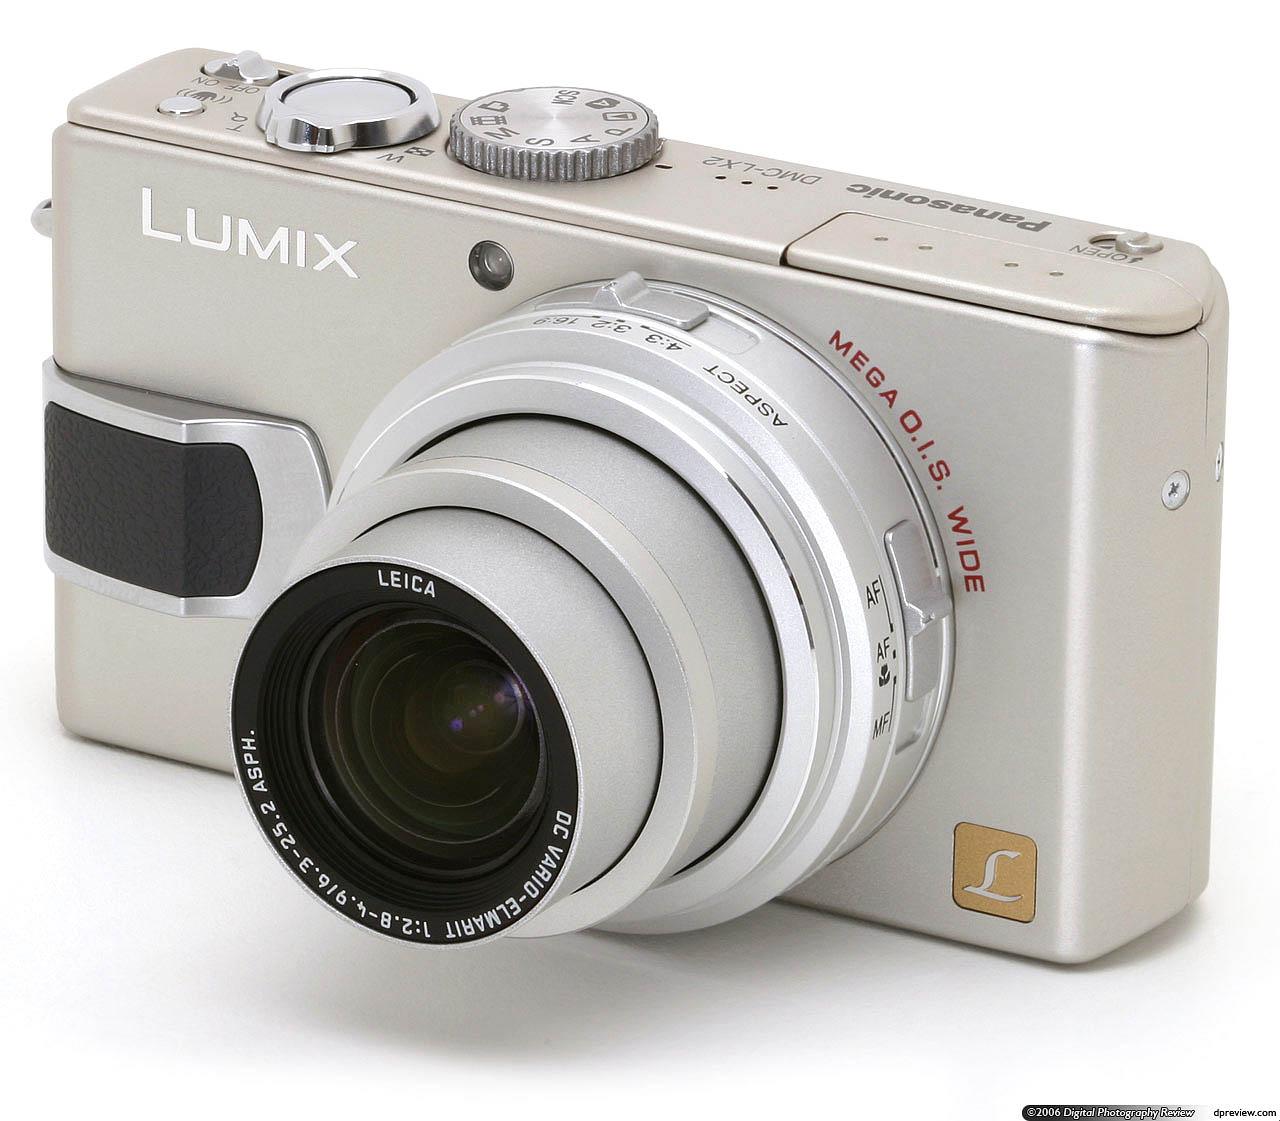 Panasonic lumix dmc lx2 | letsgodigital.